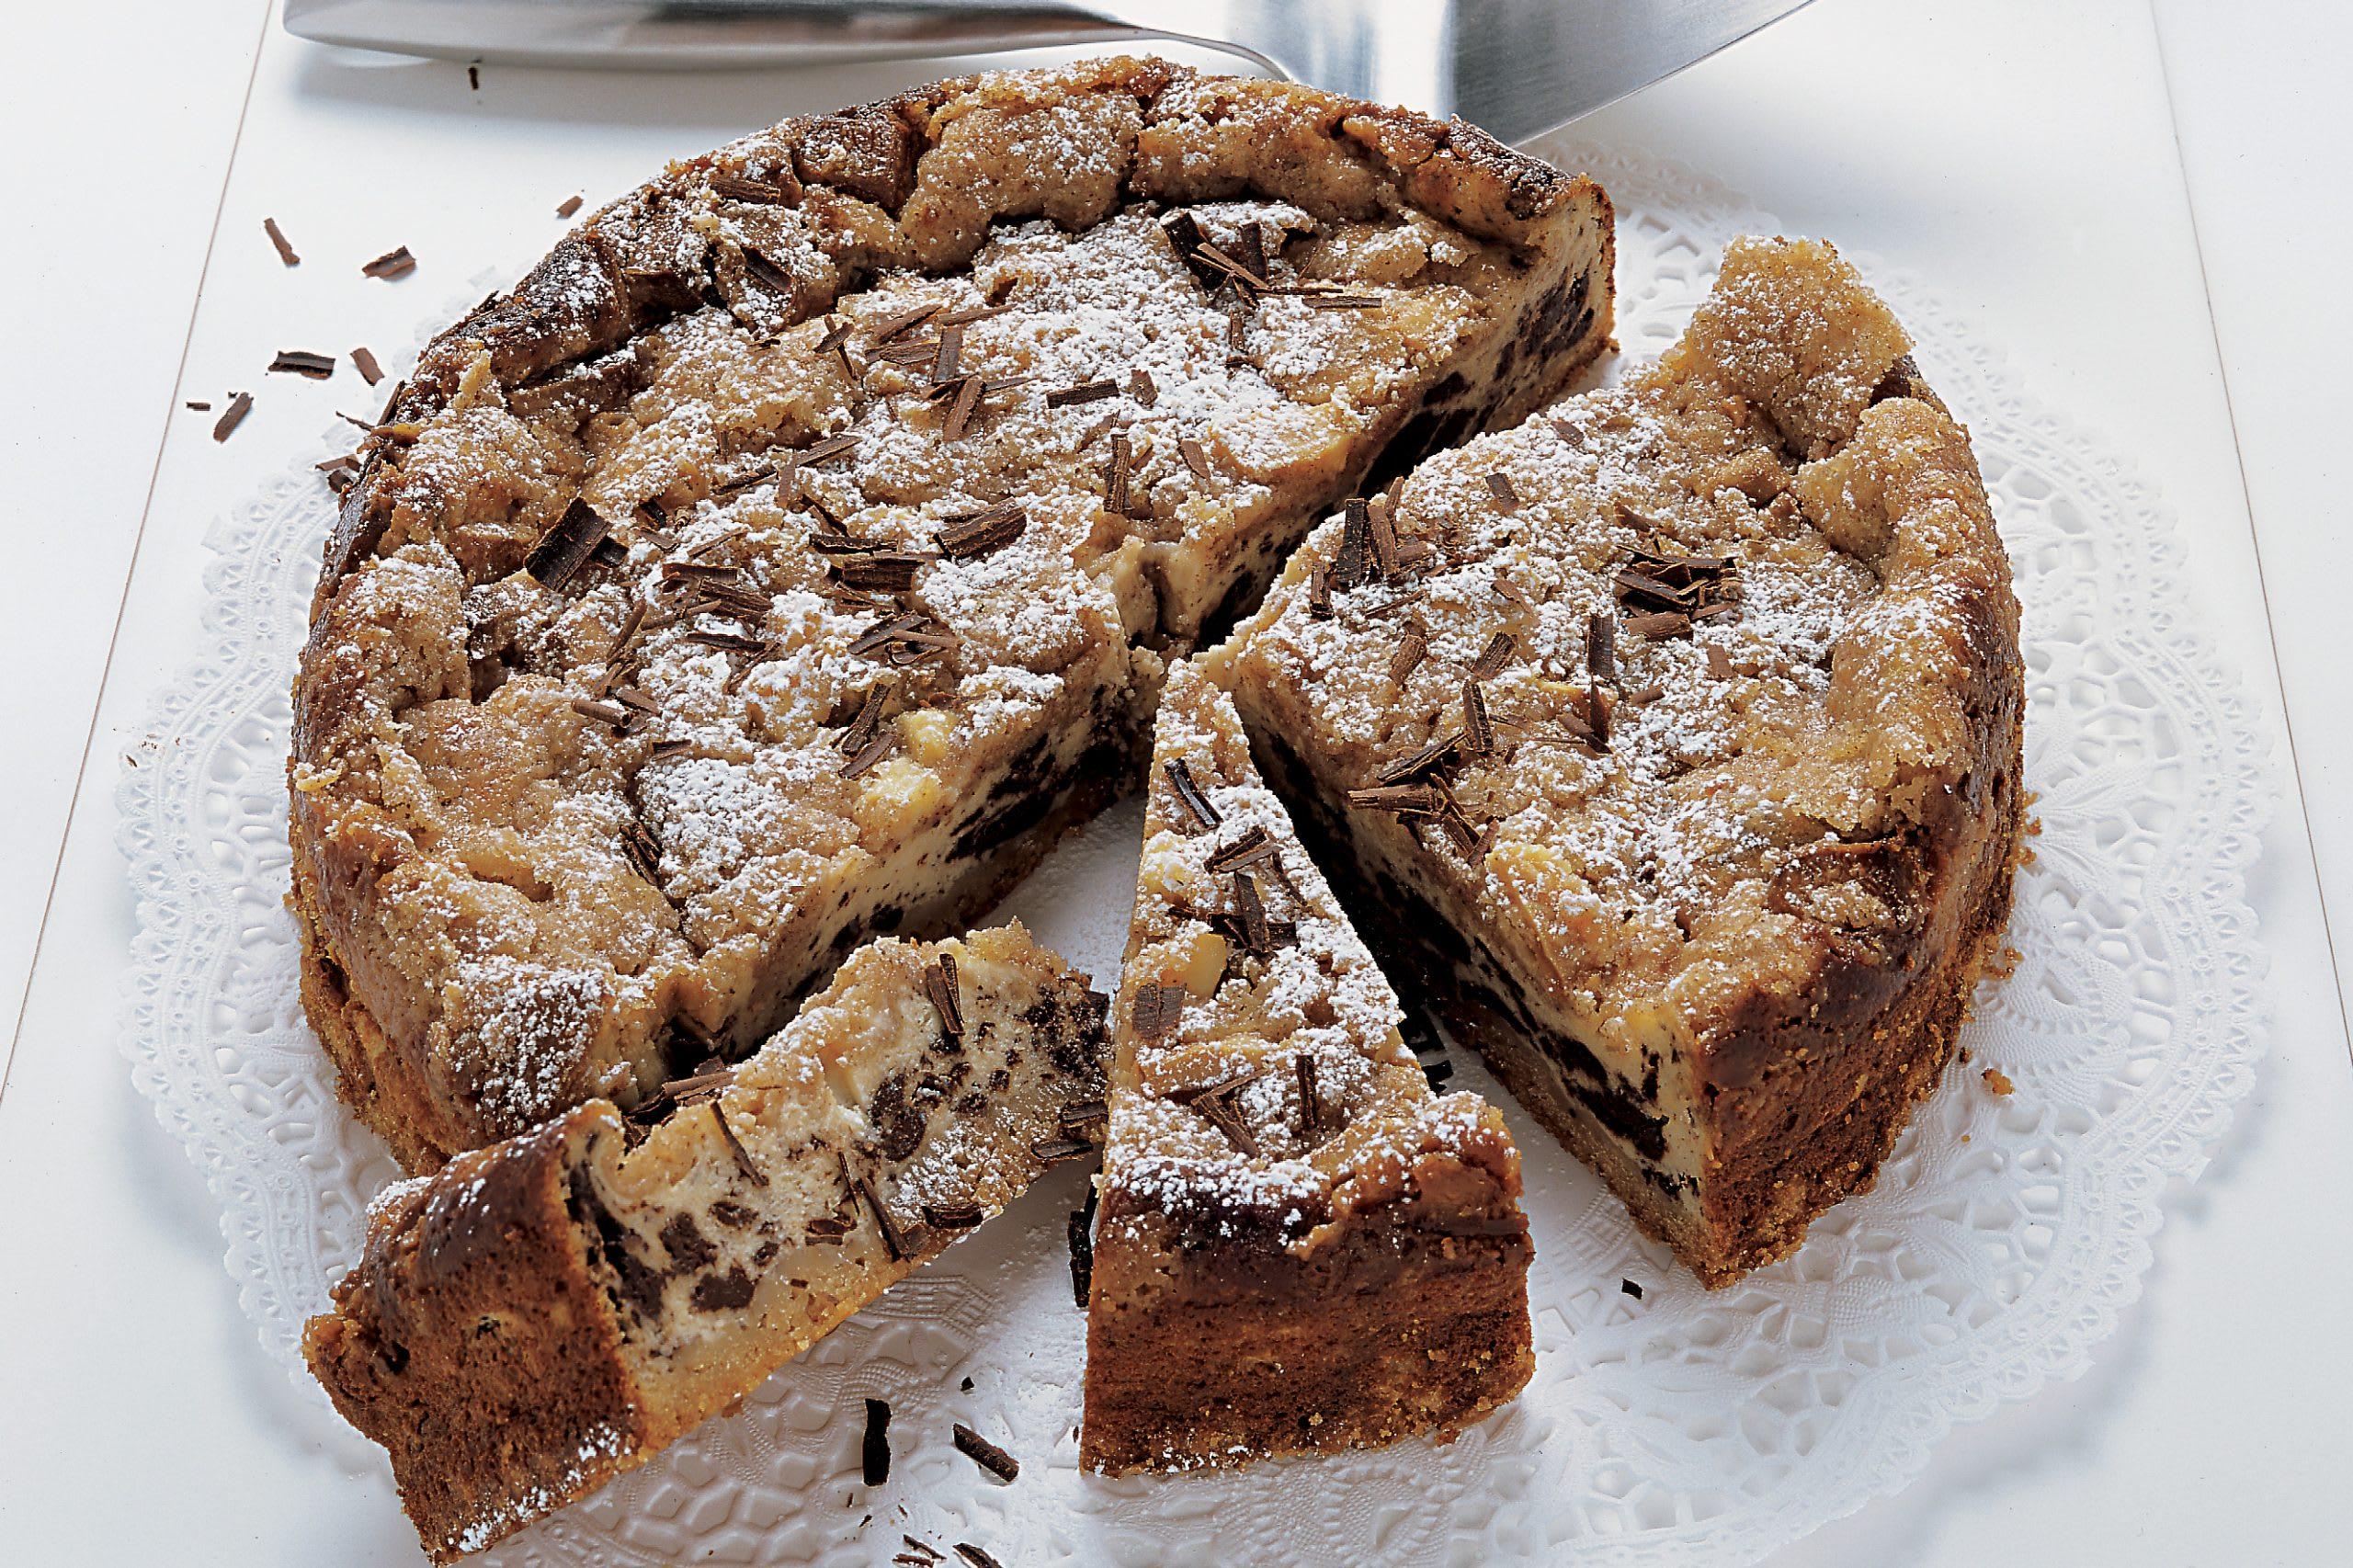 Gâteau crumble au chocolat